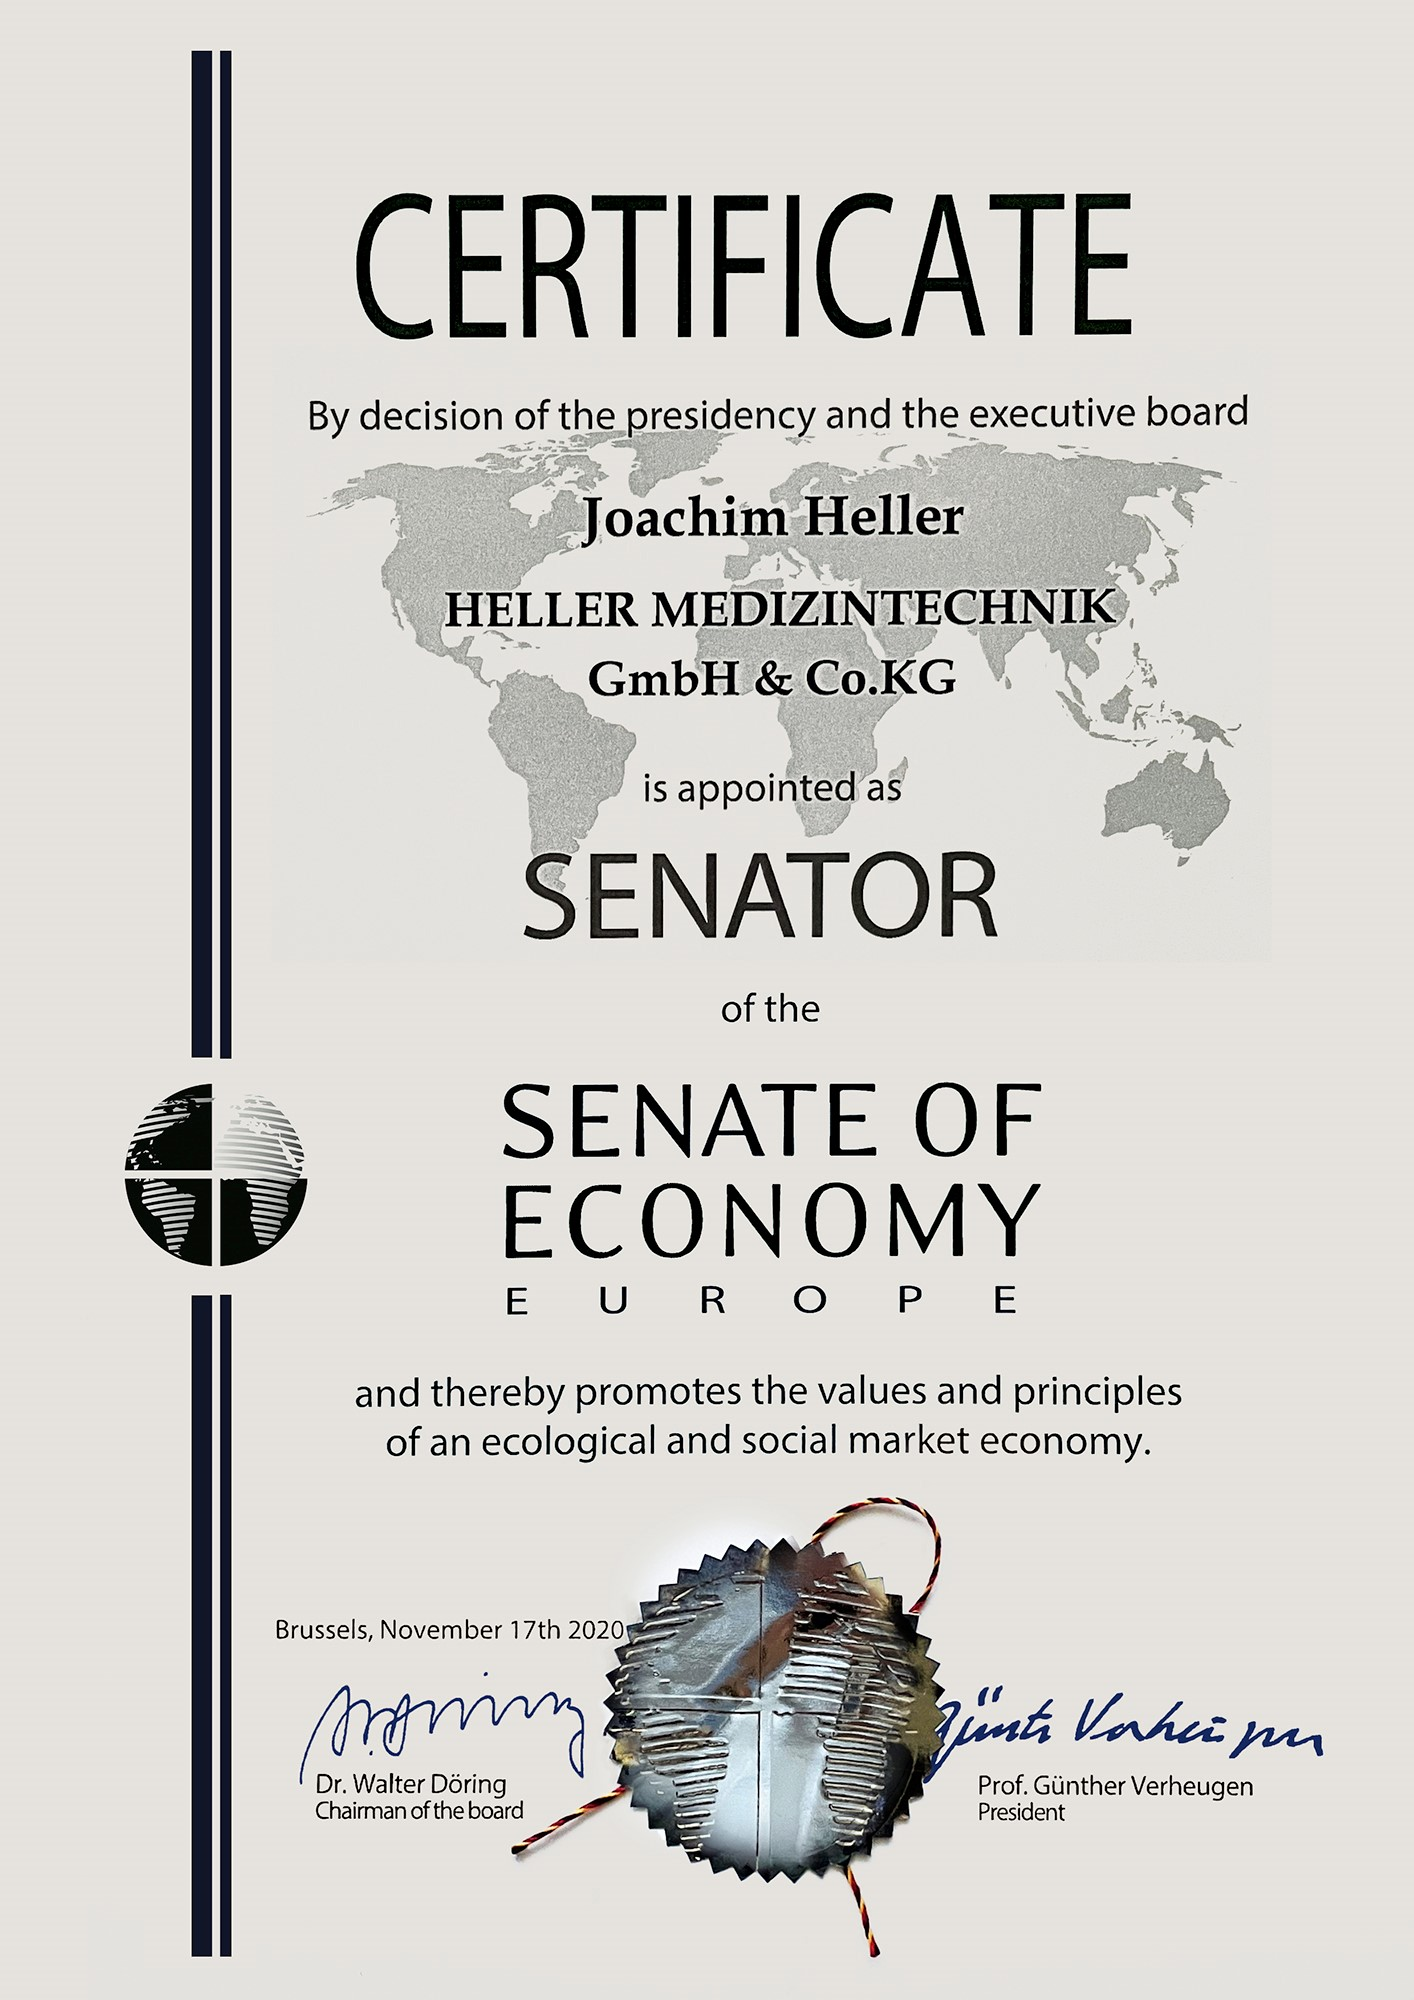 Joachim Heller | Geschäftsführer von HELLER MEDIZINTECHNIK GmbH & Co. KG | Zertifikat: SENATOR of the SENATE OF ECONOMY EUROPE